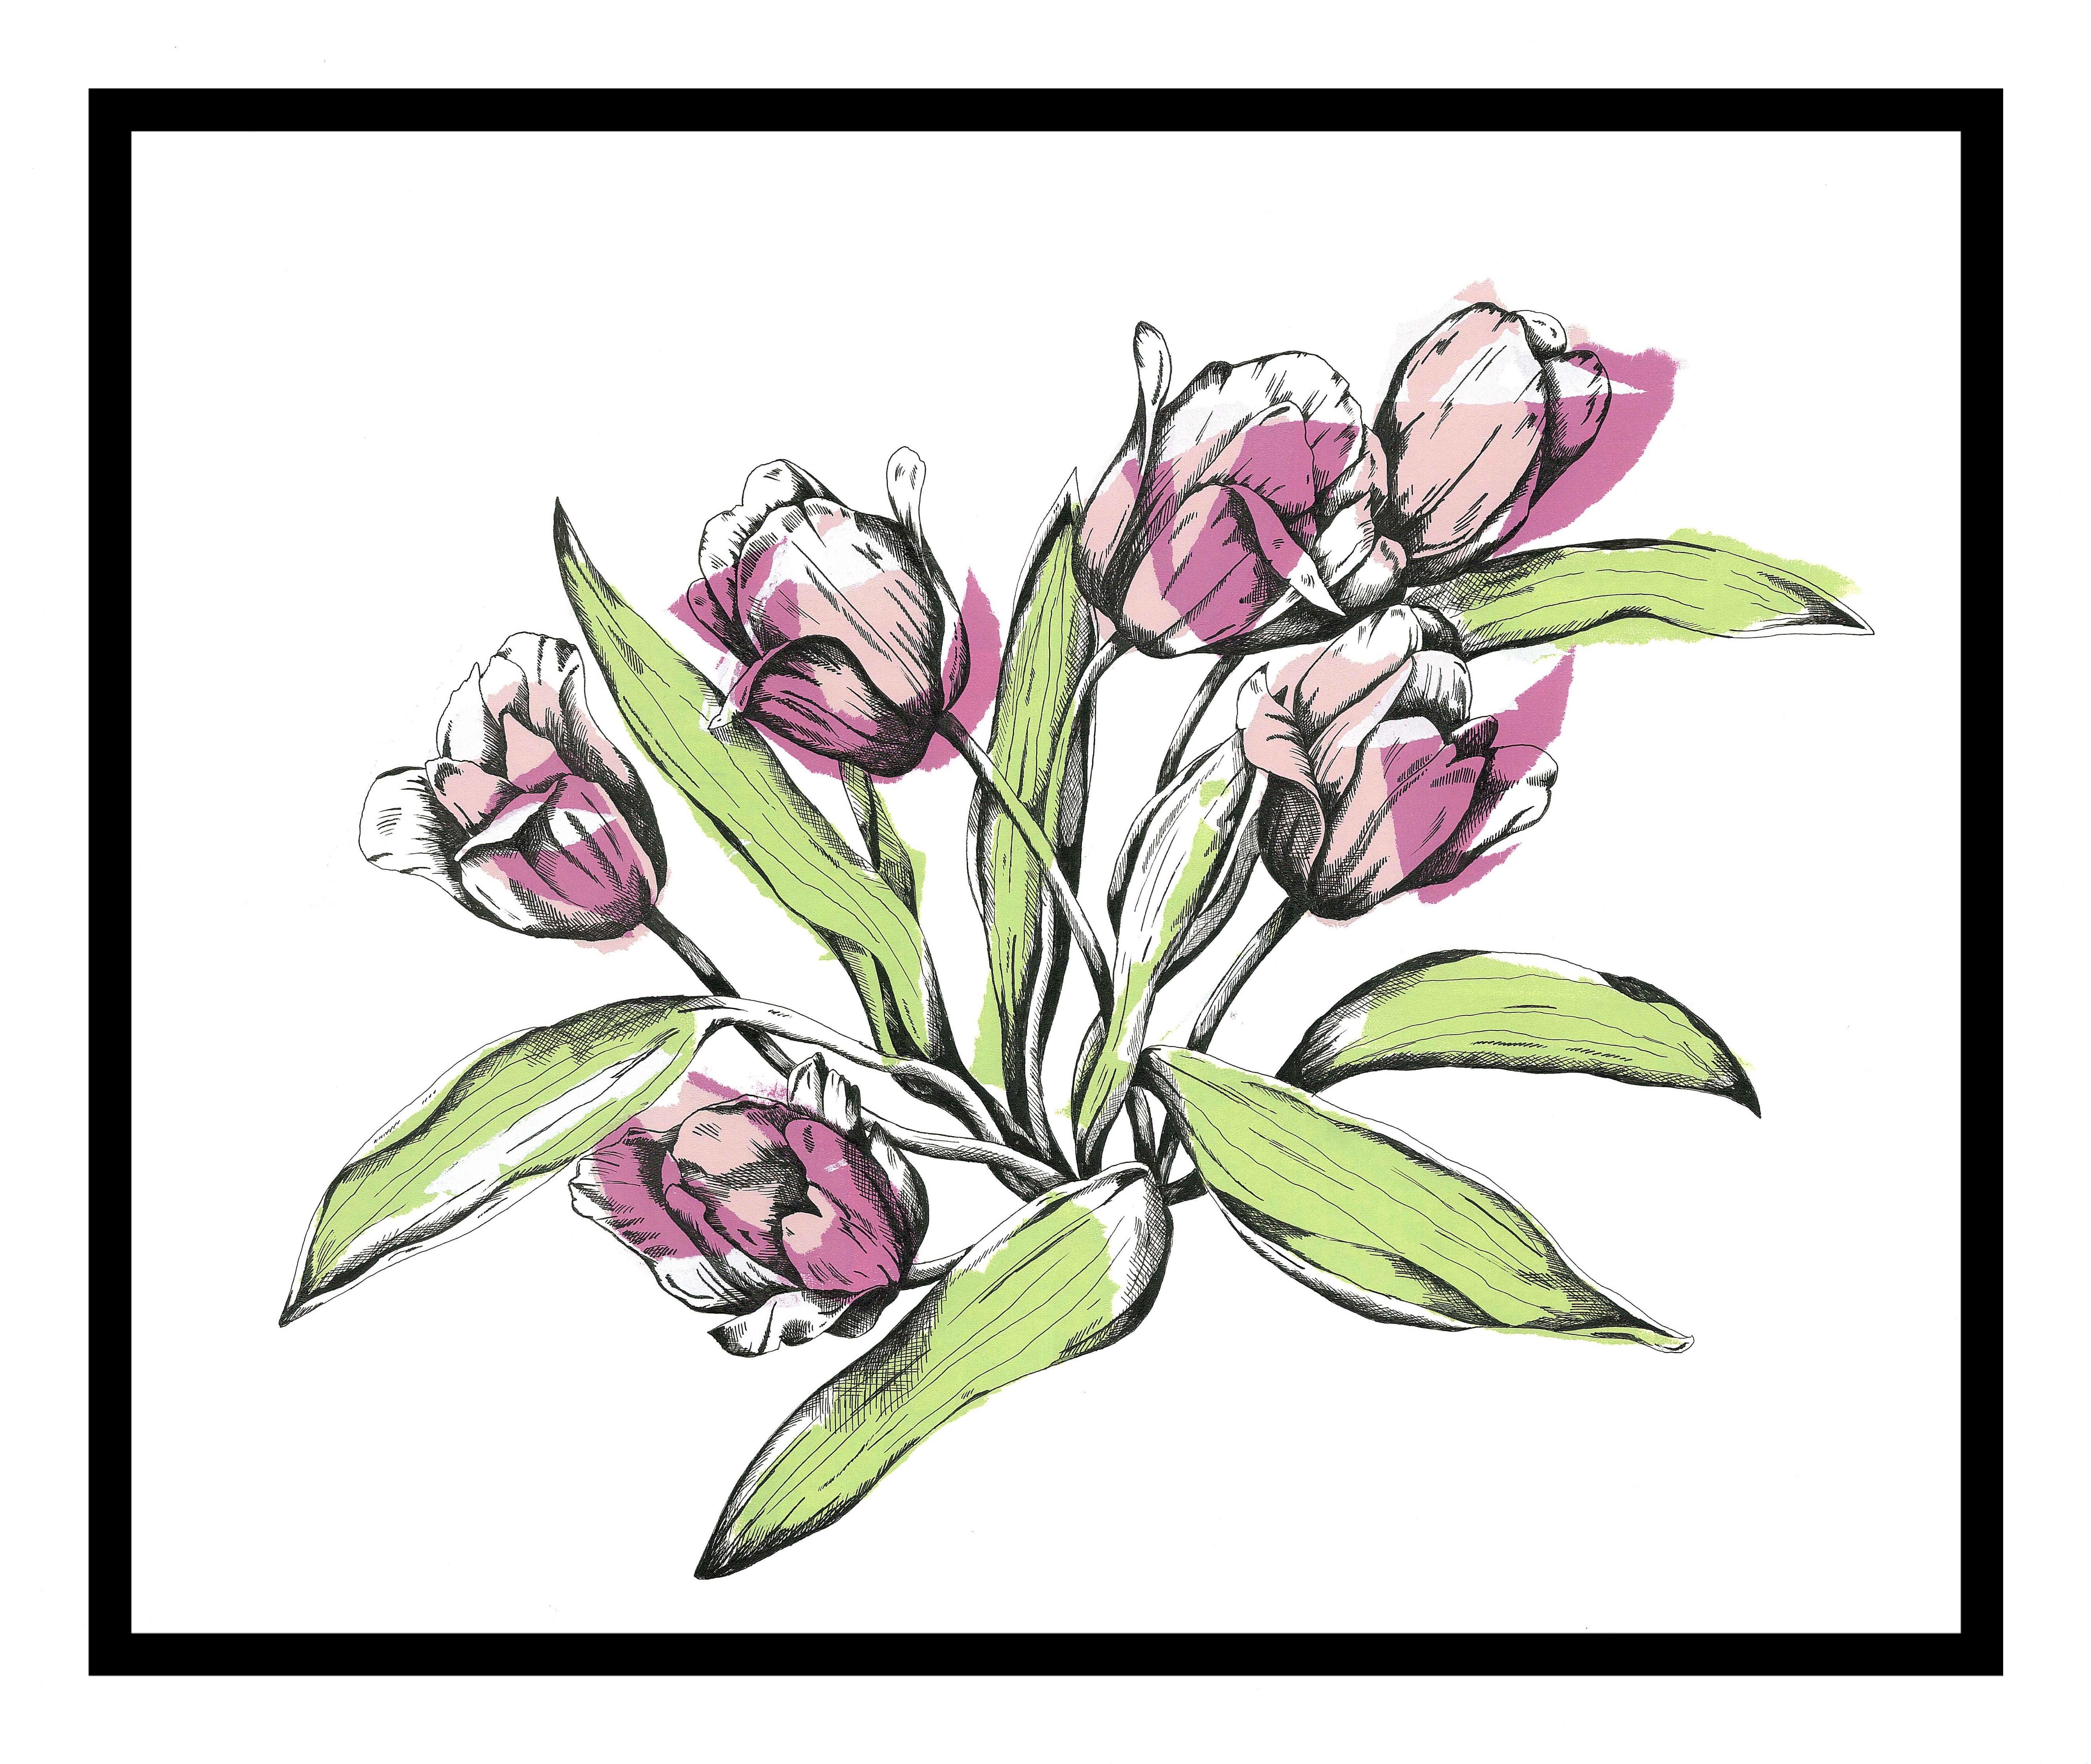 'Tulips - Original Screenprint' by artist Joanna Mcdonough